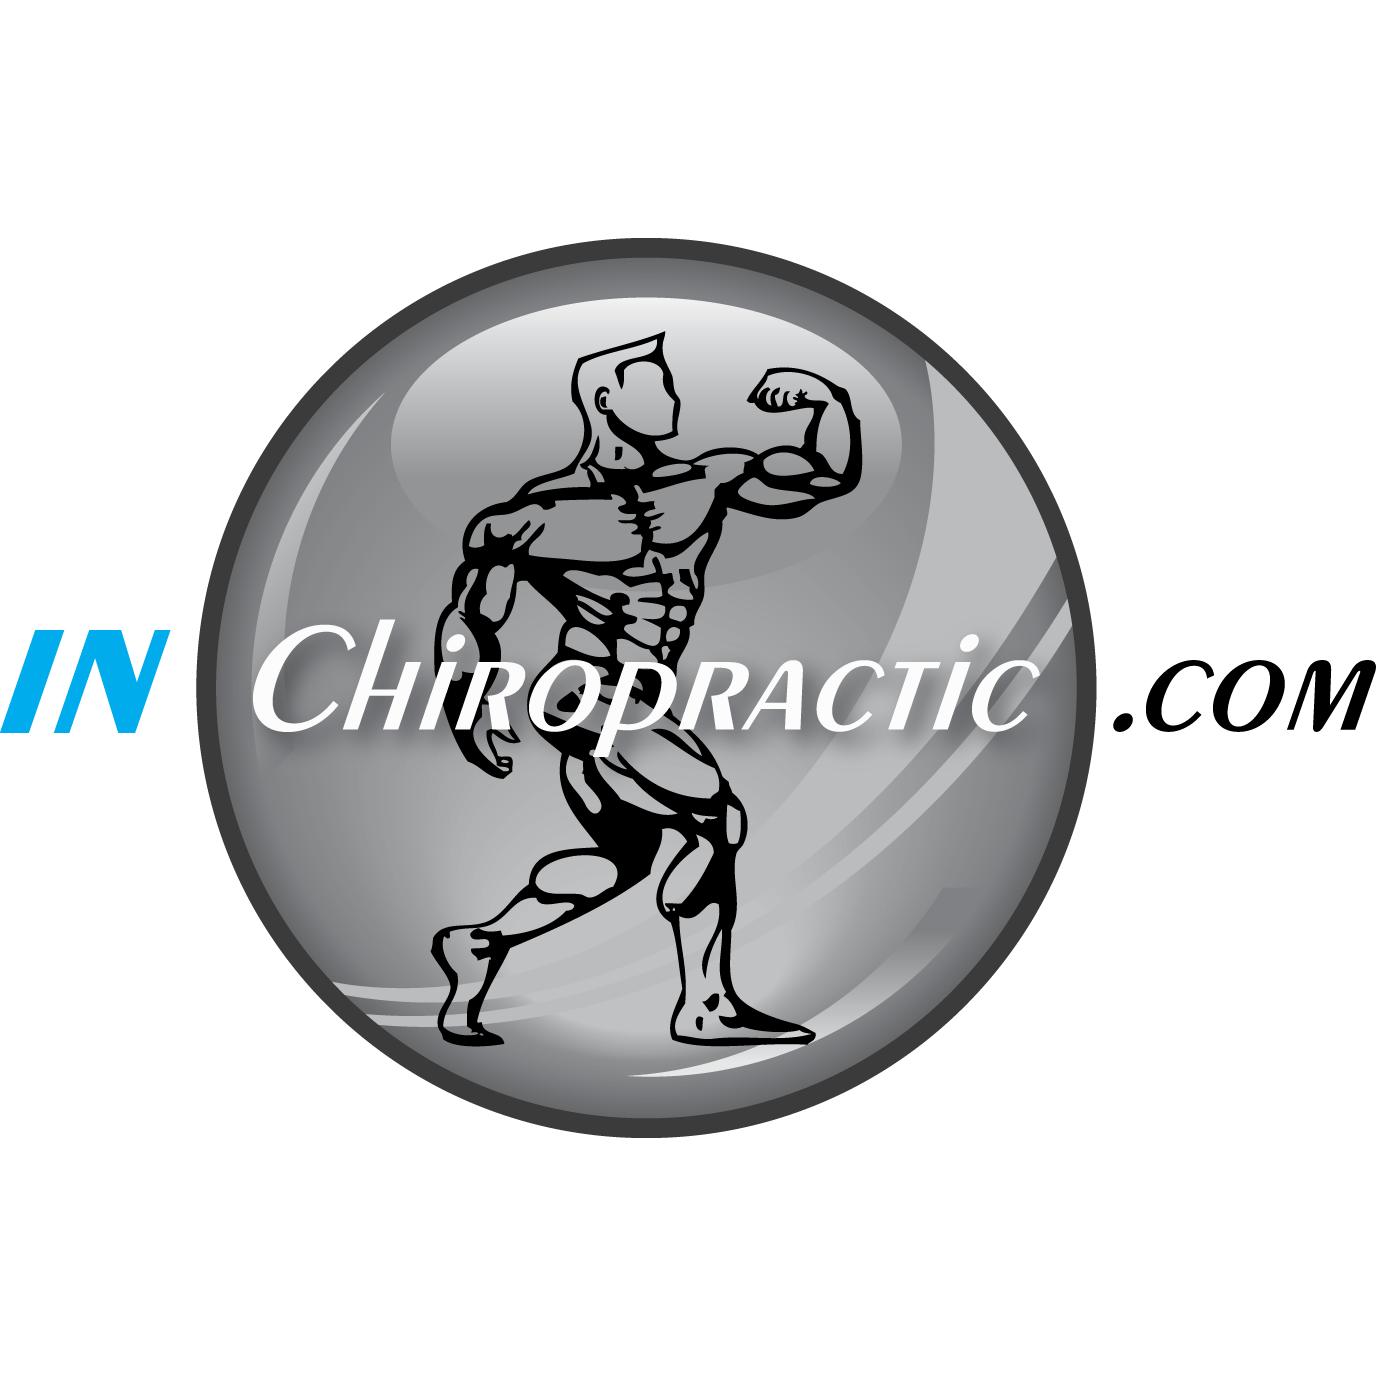 IN Chiropractor.com image 0